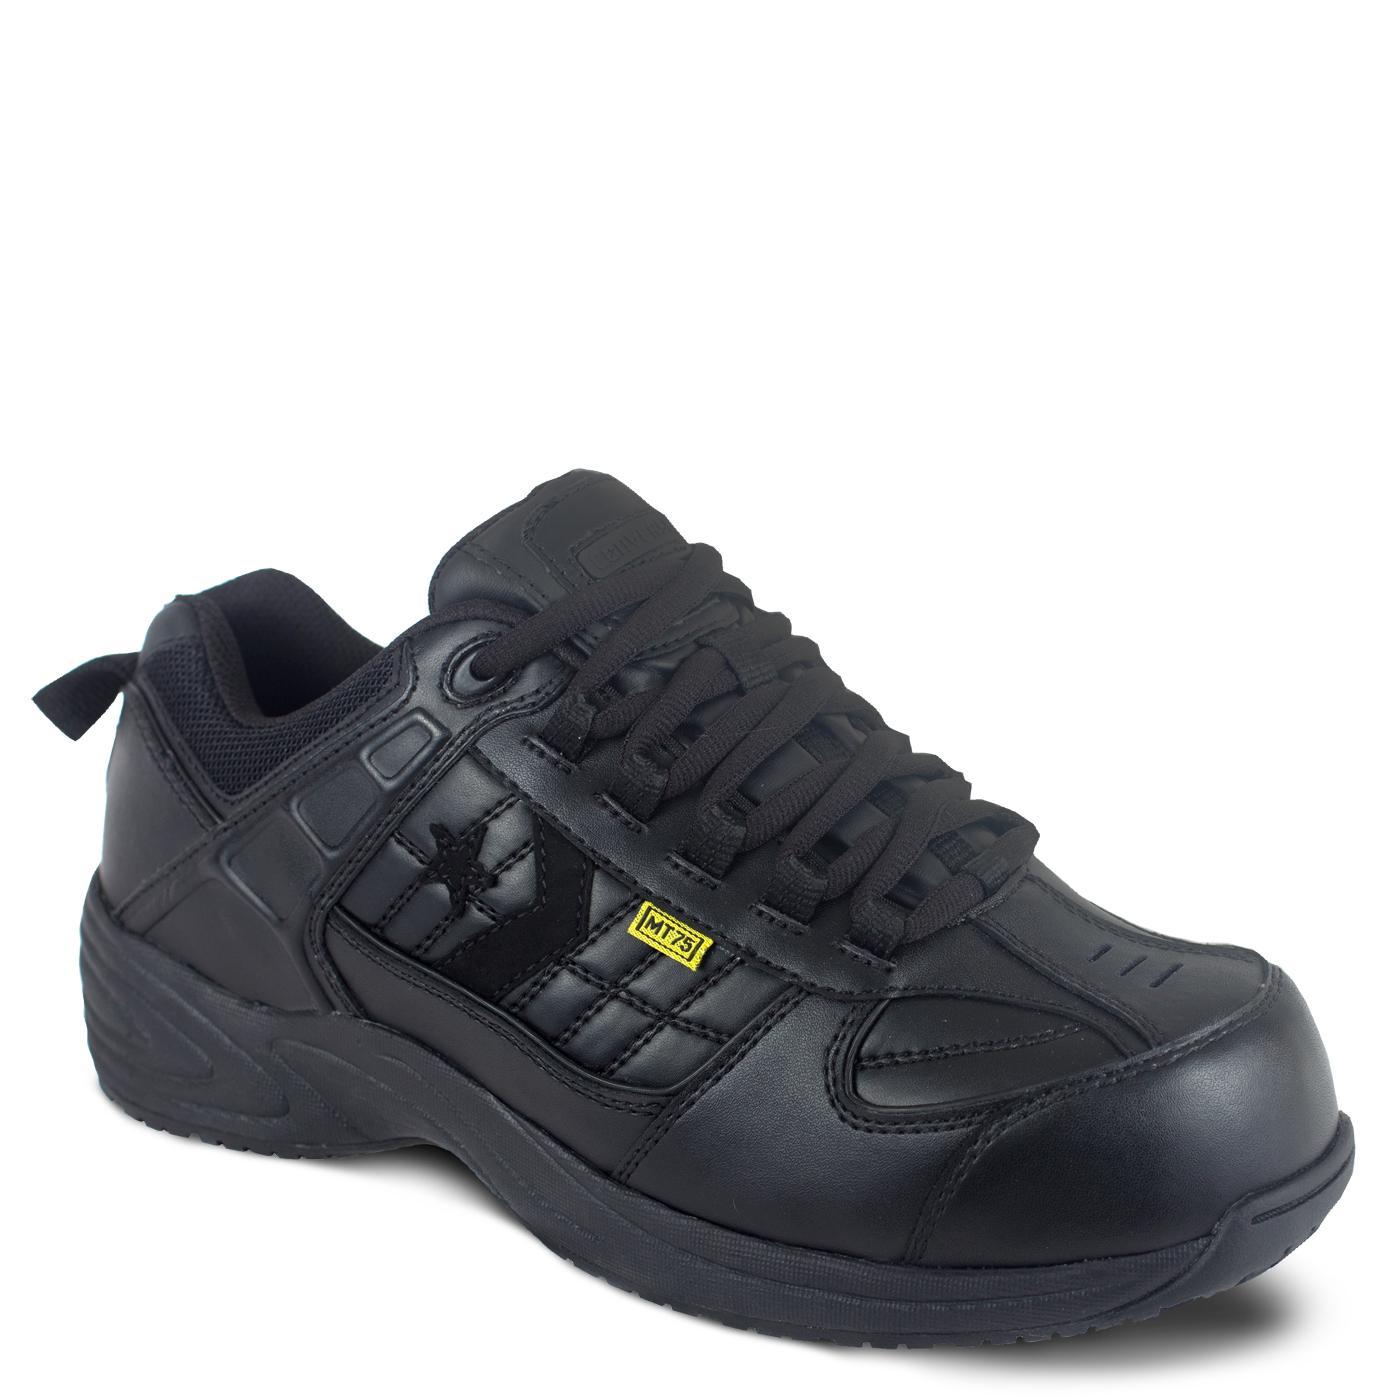 2efa114506b888 Converse womens locut internal metatarsal guard work shoe large jpg  1400x1400 Converse work boots chemical resistant